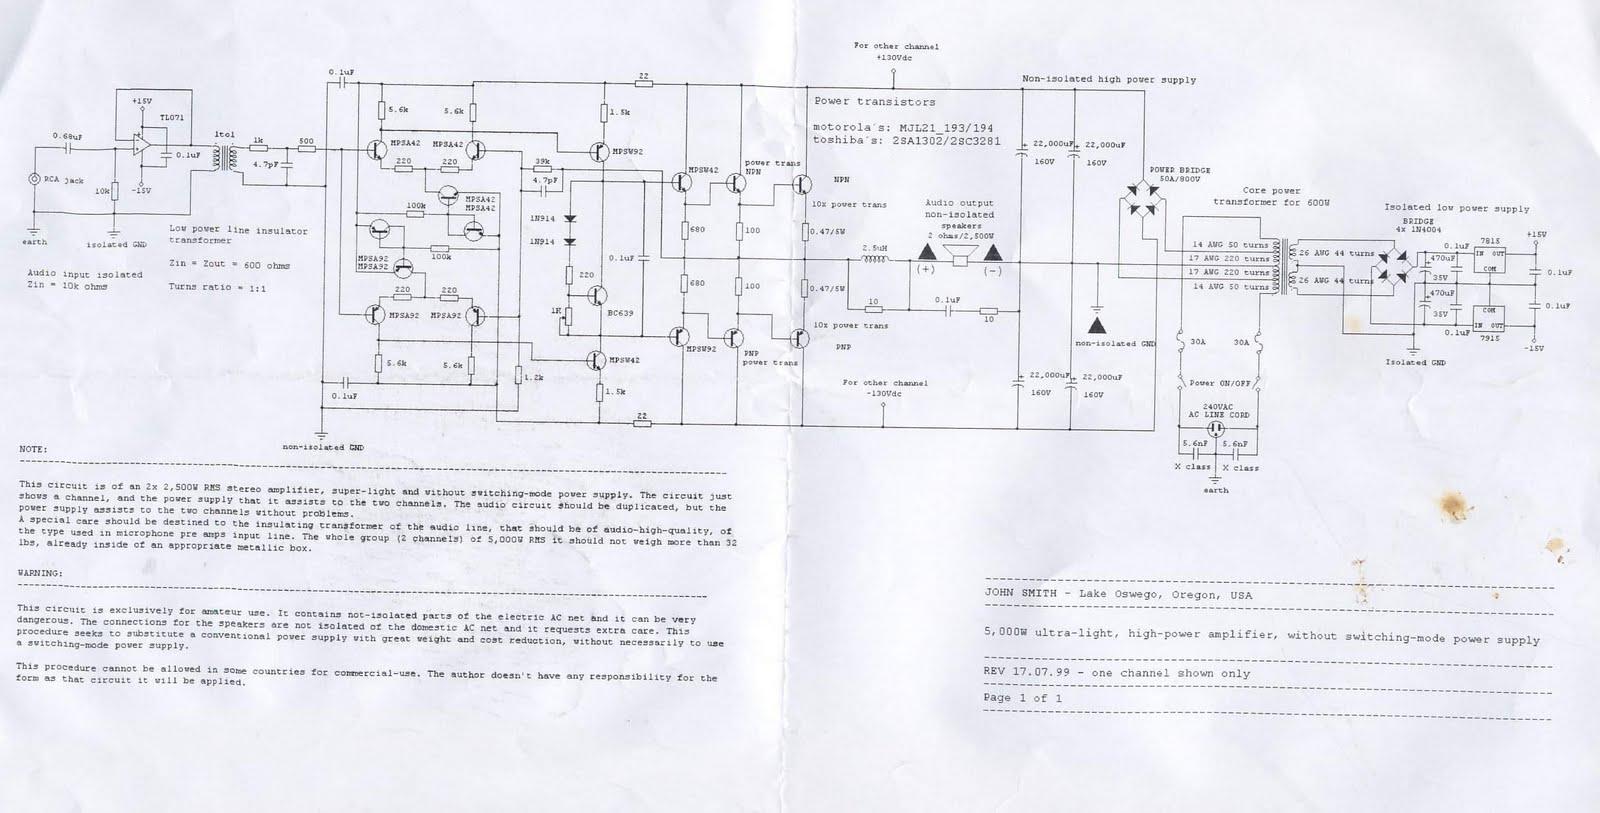 panasonic refrigerator circuit diagram